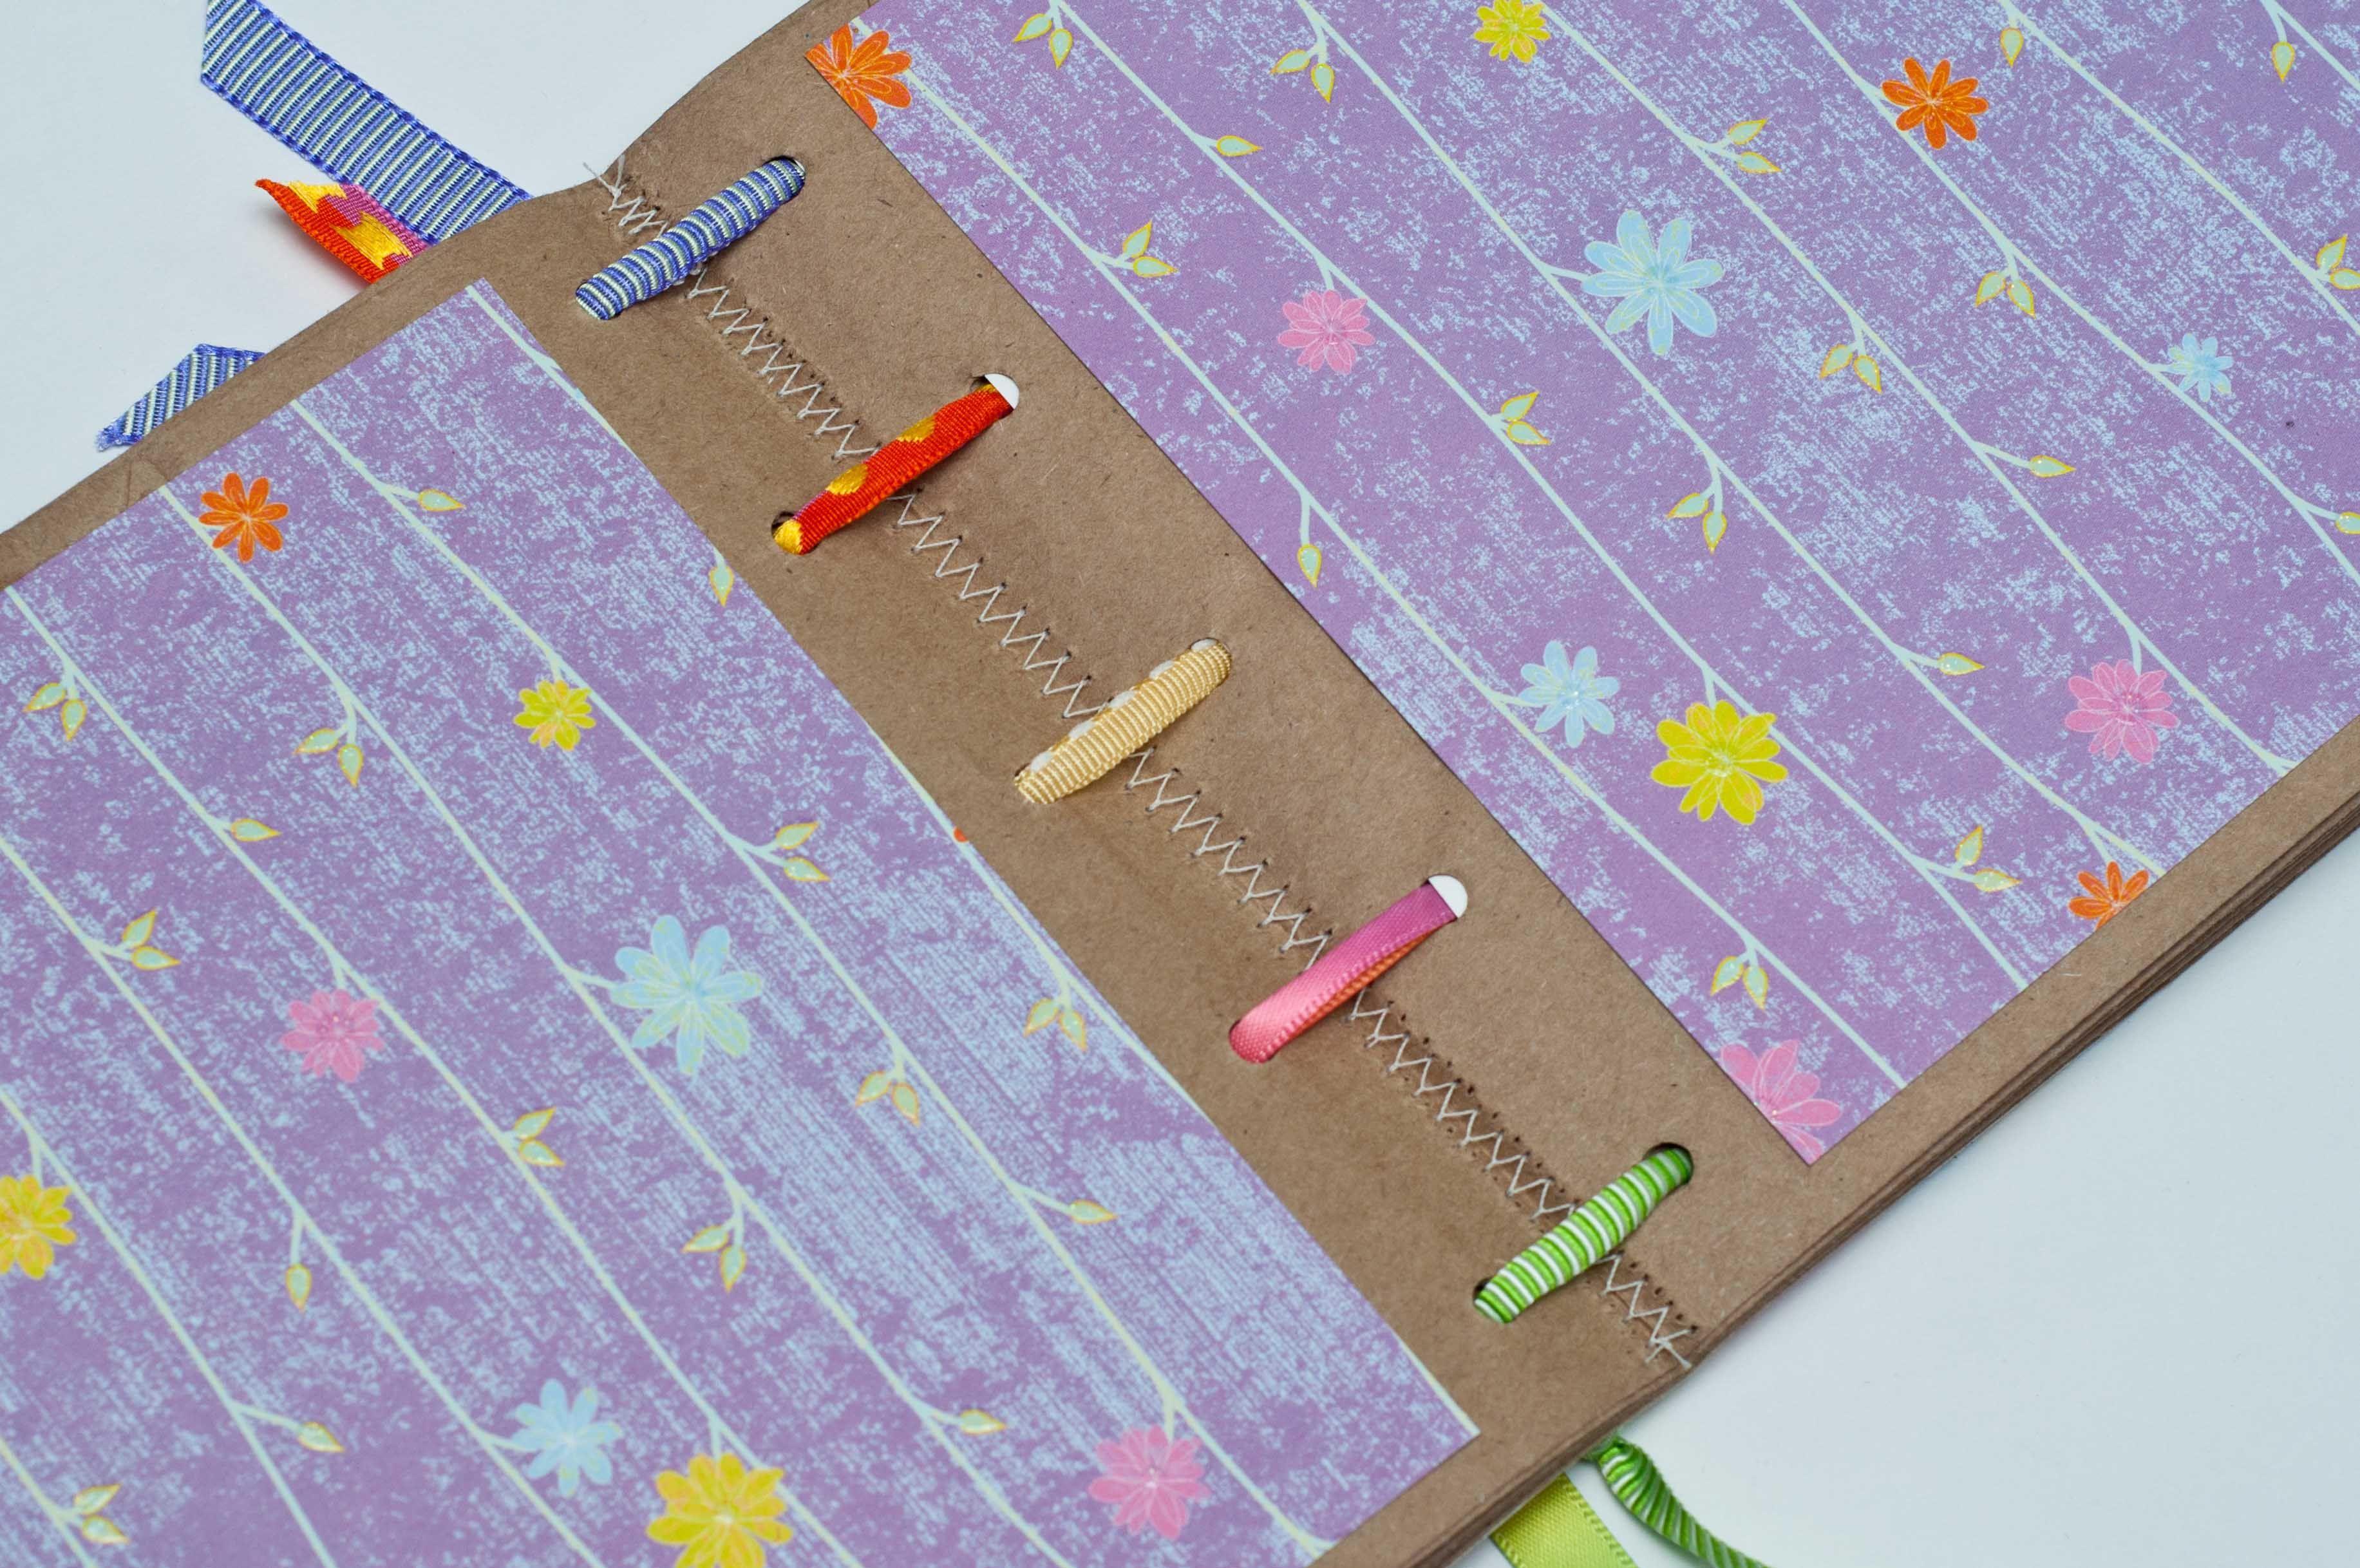 Diy Ribbon Book Cover : Diy book binding with ribbon notebooks paper